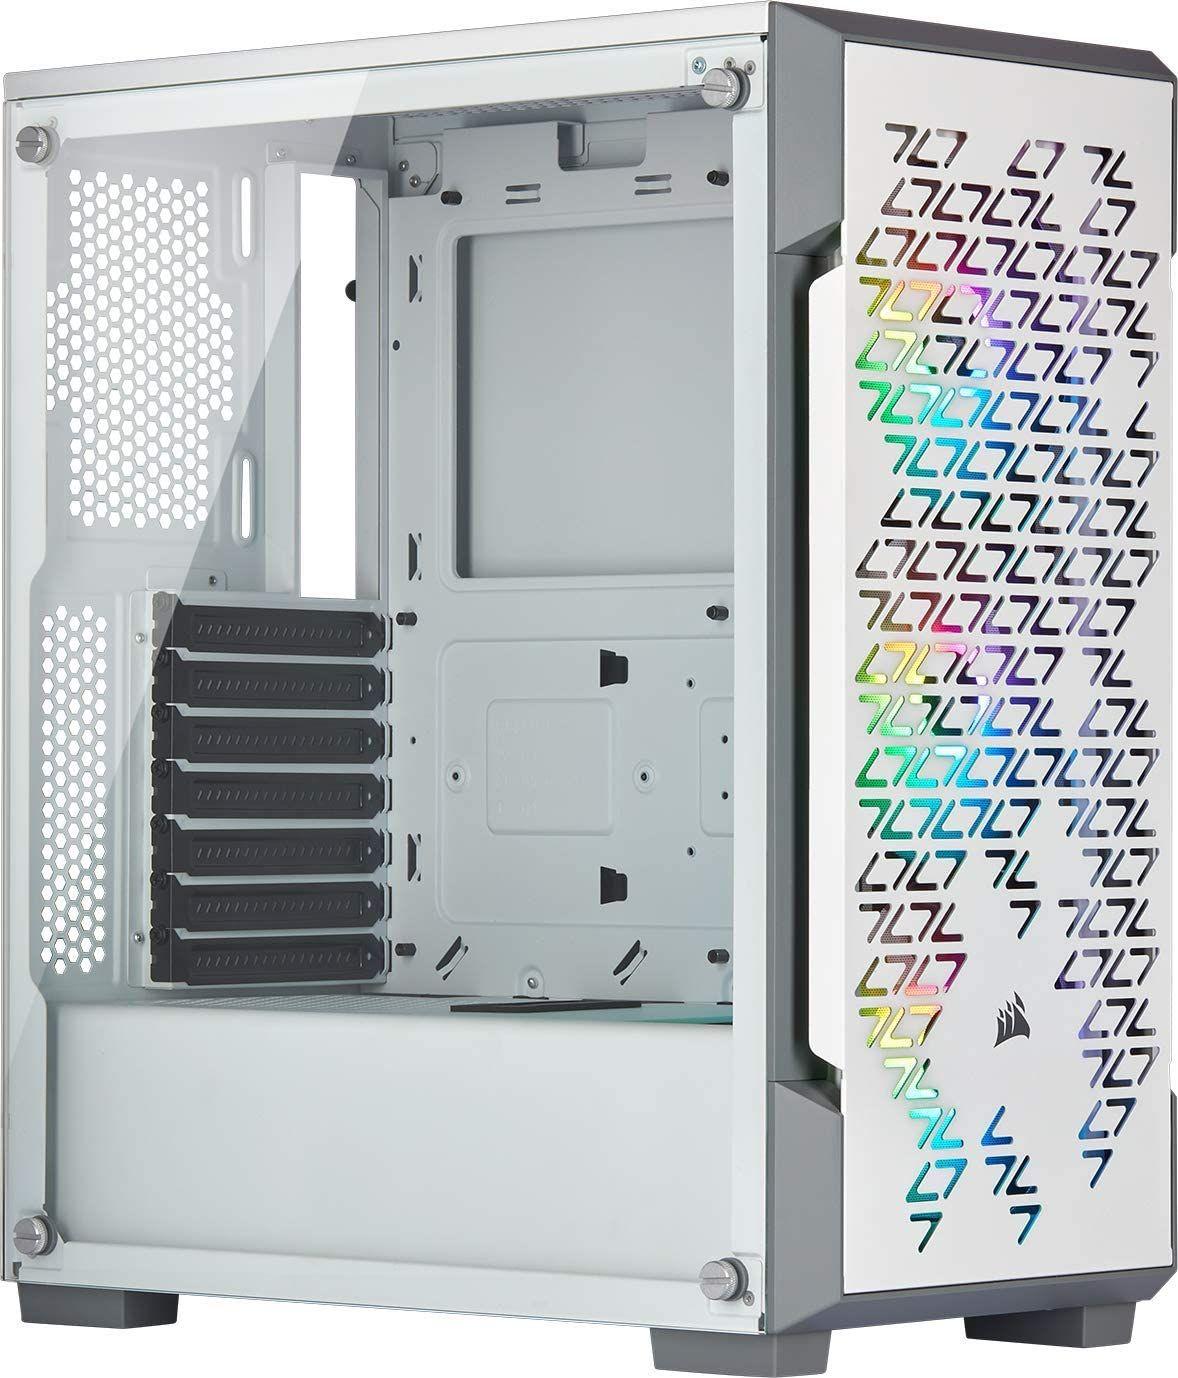 Corsair iCUE 220T RGB Airflow PC-Gehäuse (Midi Tower, inkl. 3x Corsair SP120 RGB Pro Lüfter, Glasfenster) Weiß